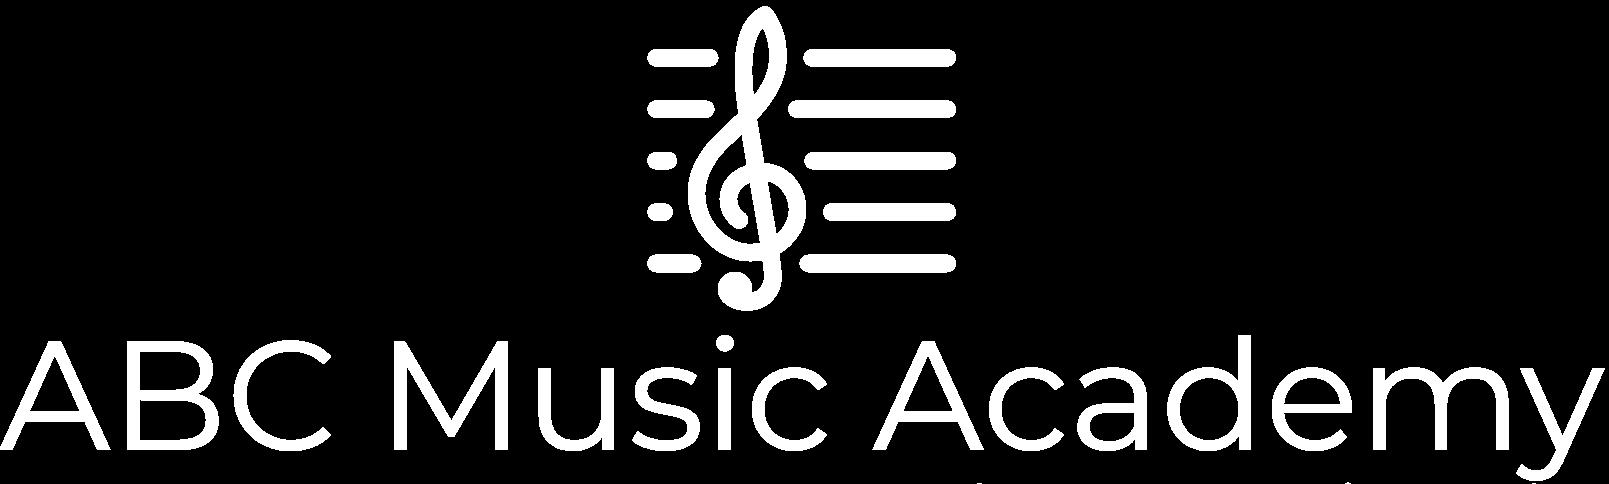 ABC-Music-Academy-logo-reworked